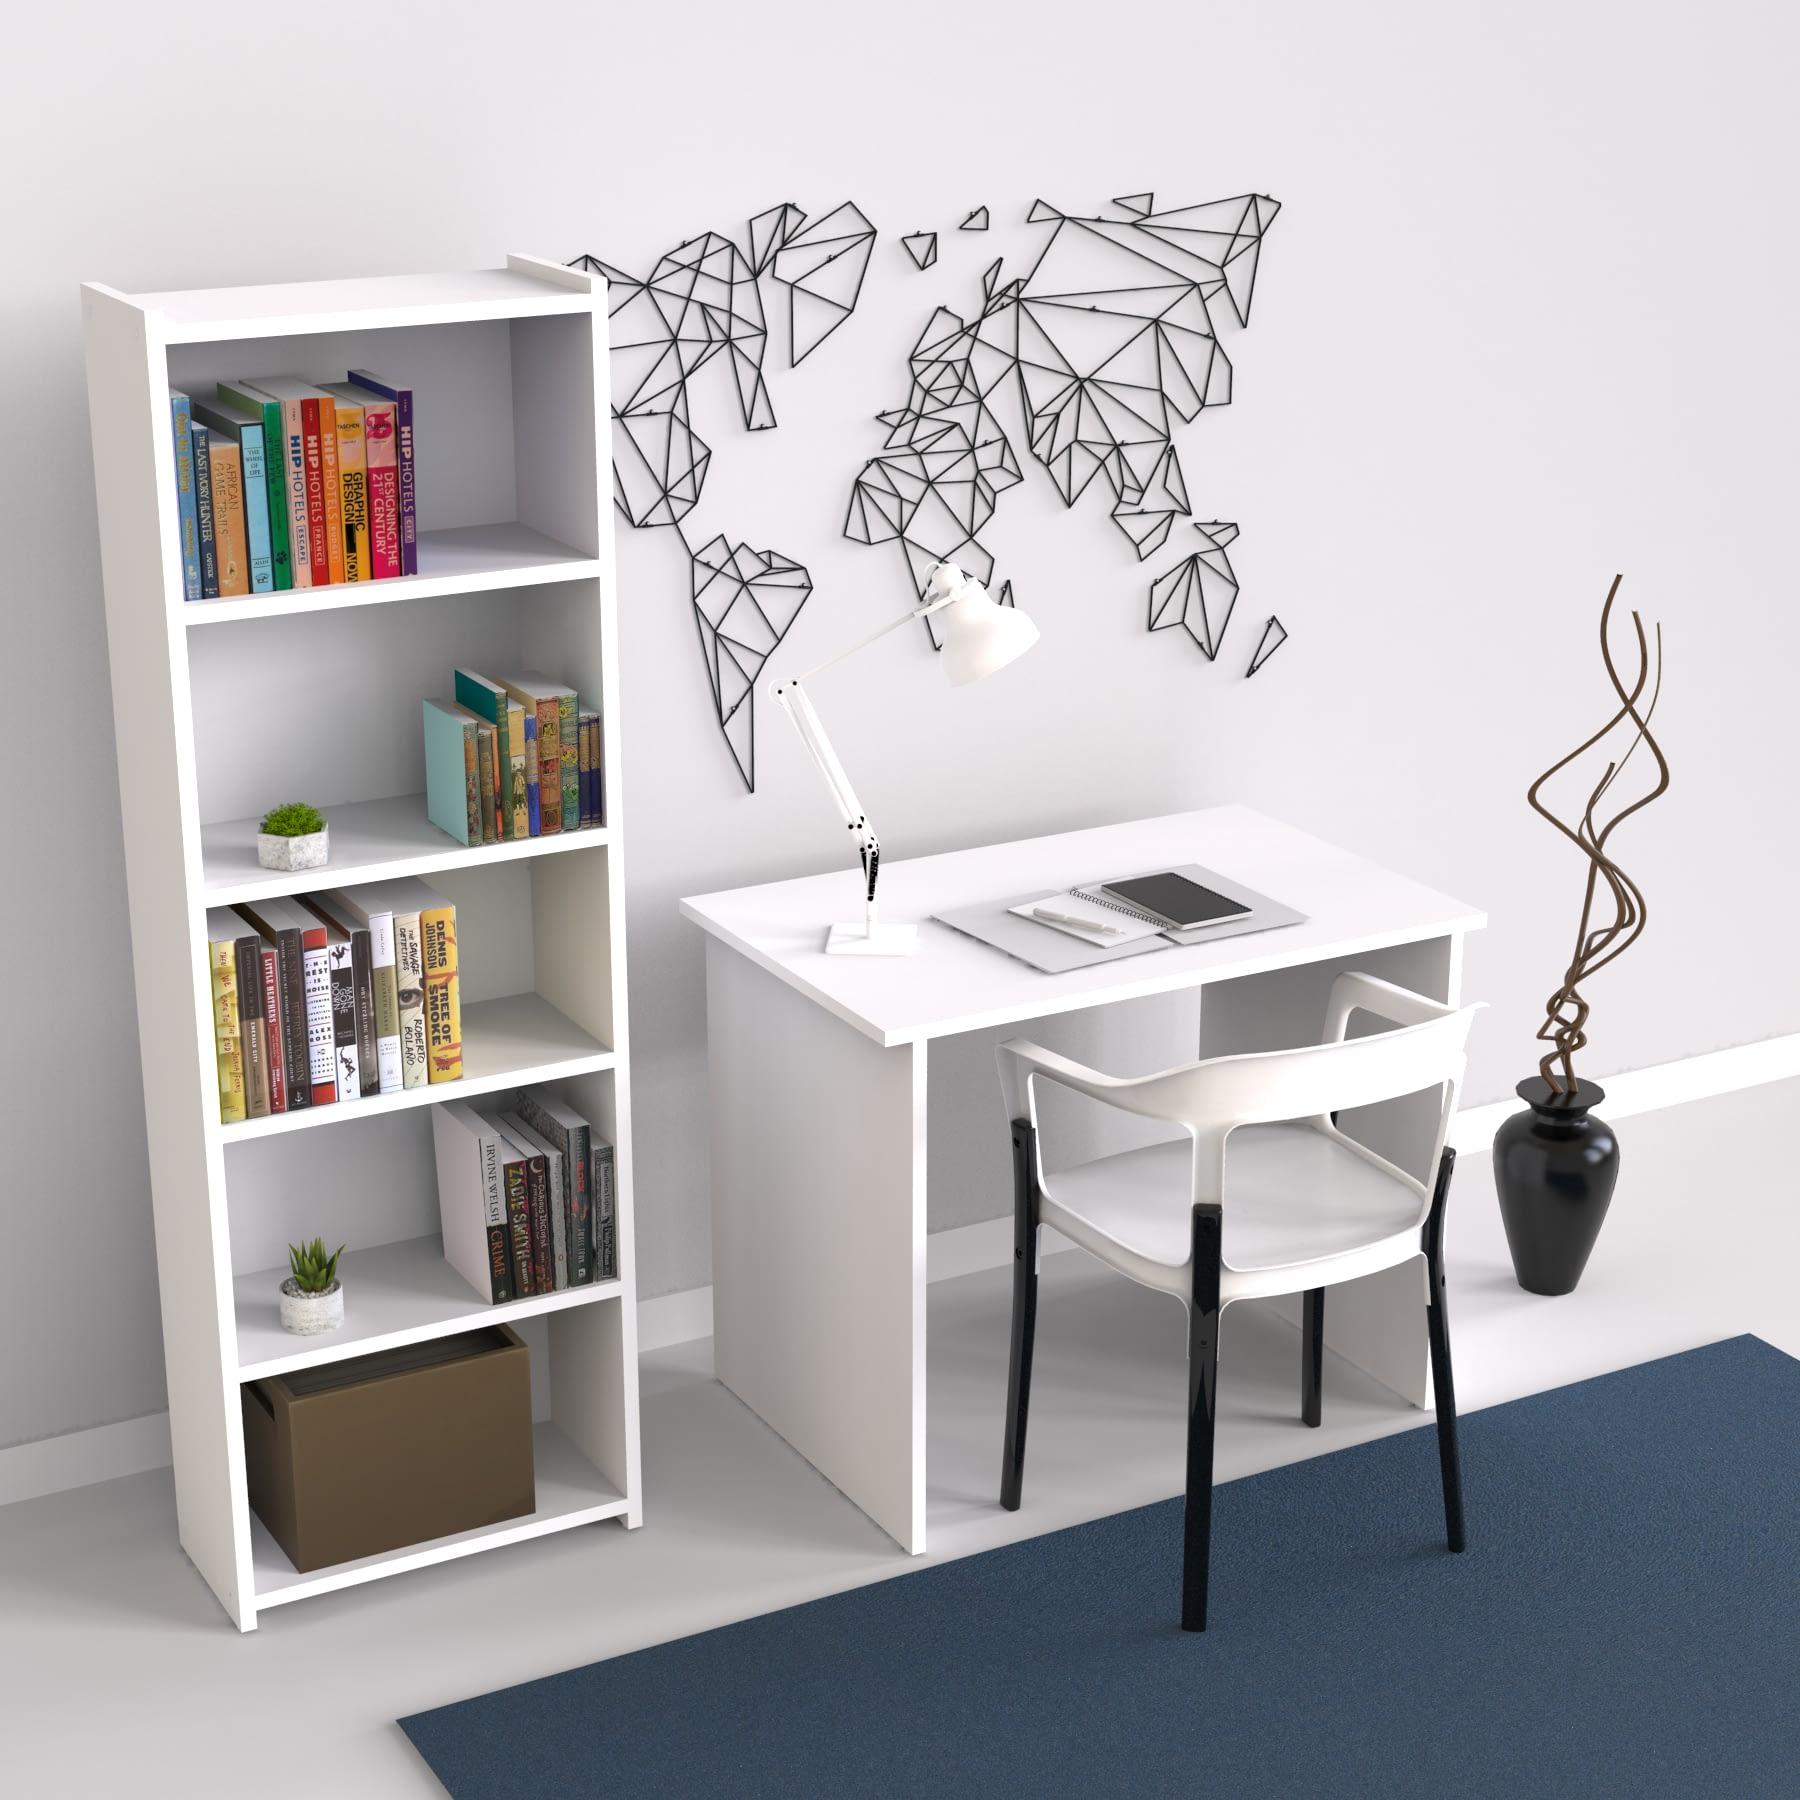 Mimilos K7 Bookcase